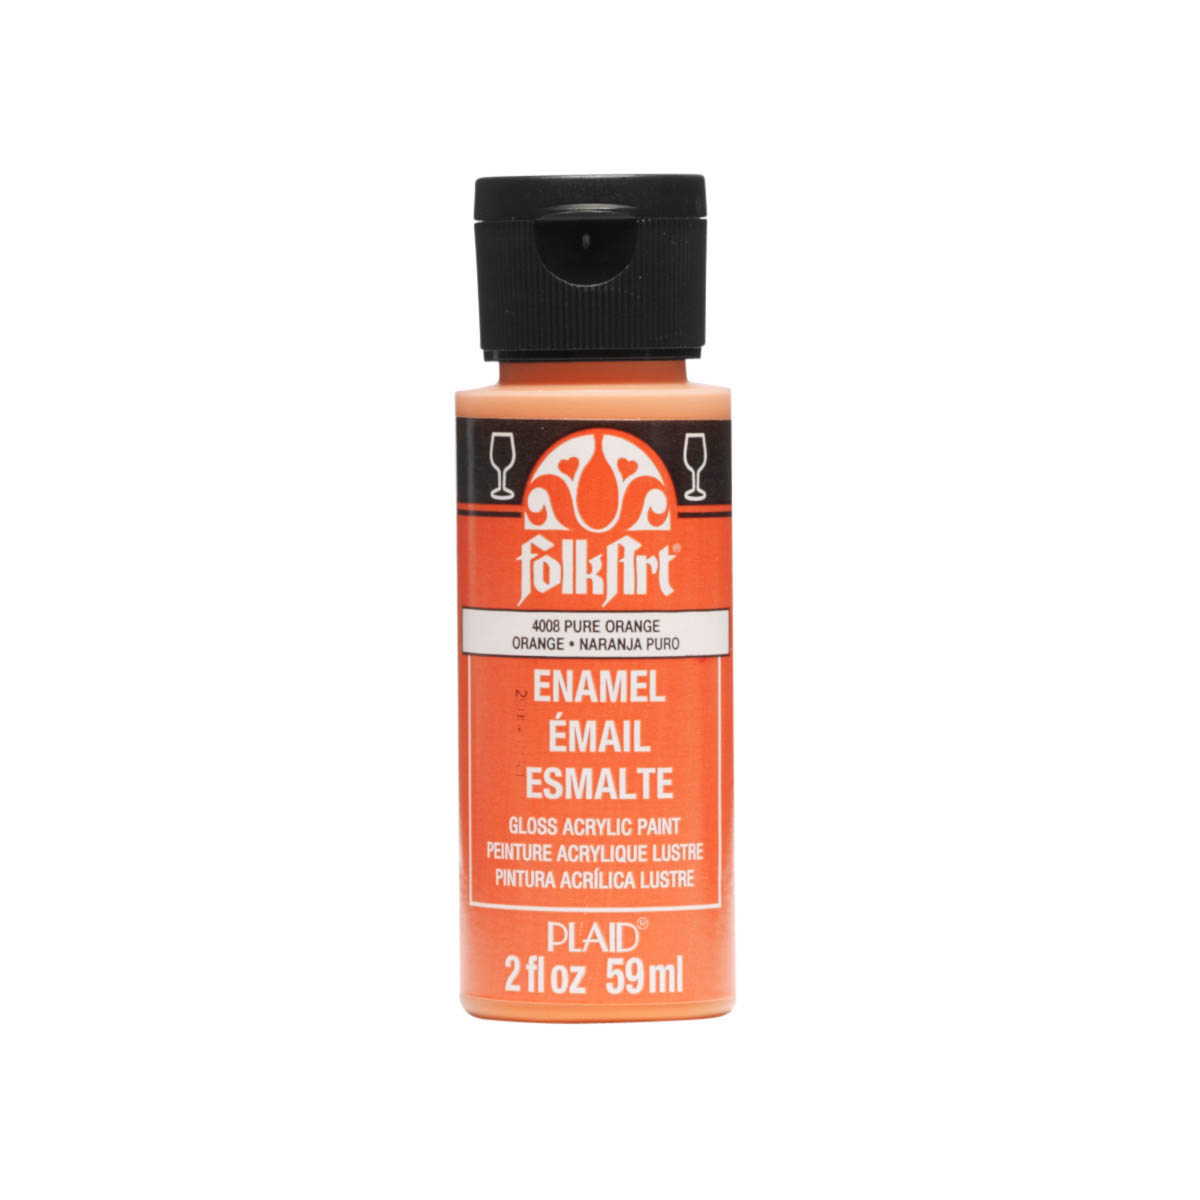 FolkArt ® Enamels™ - Pure Orange, 2 oz. - 4008